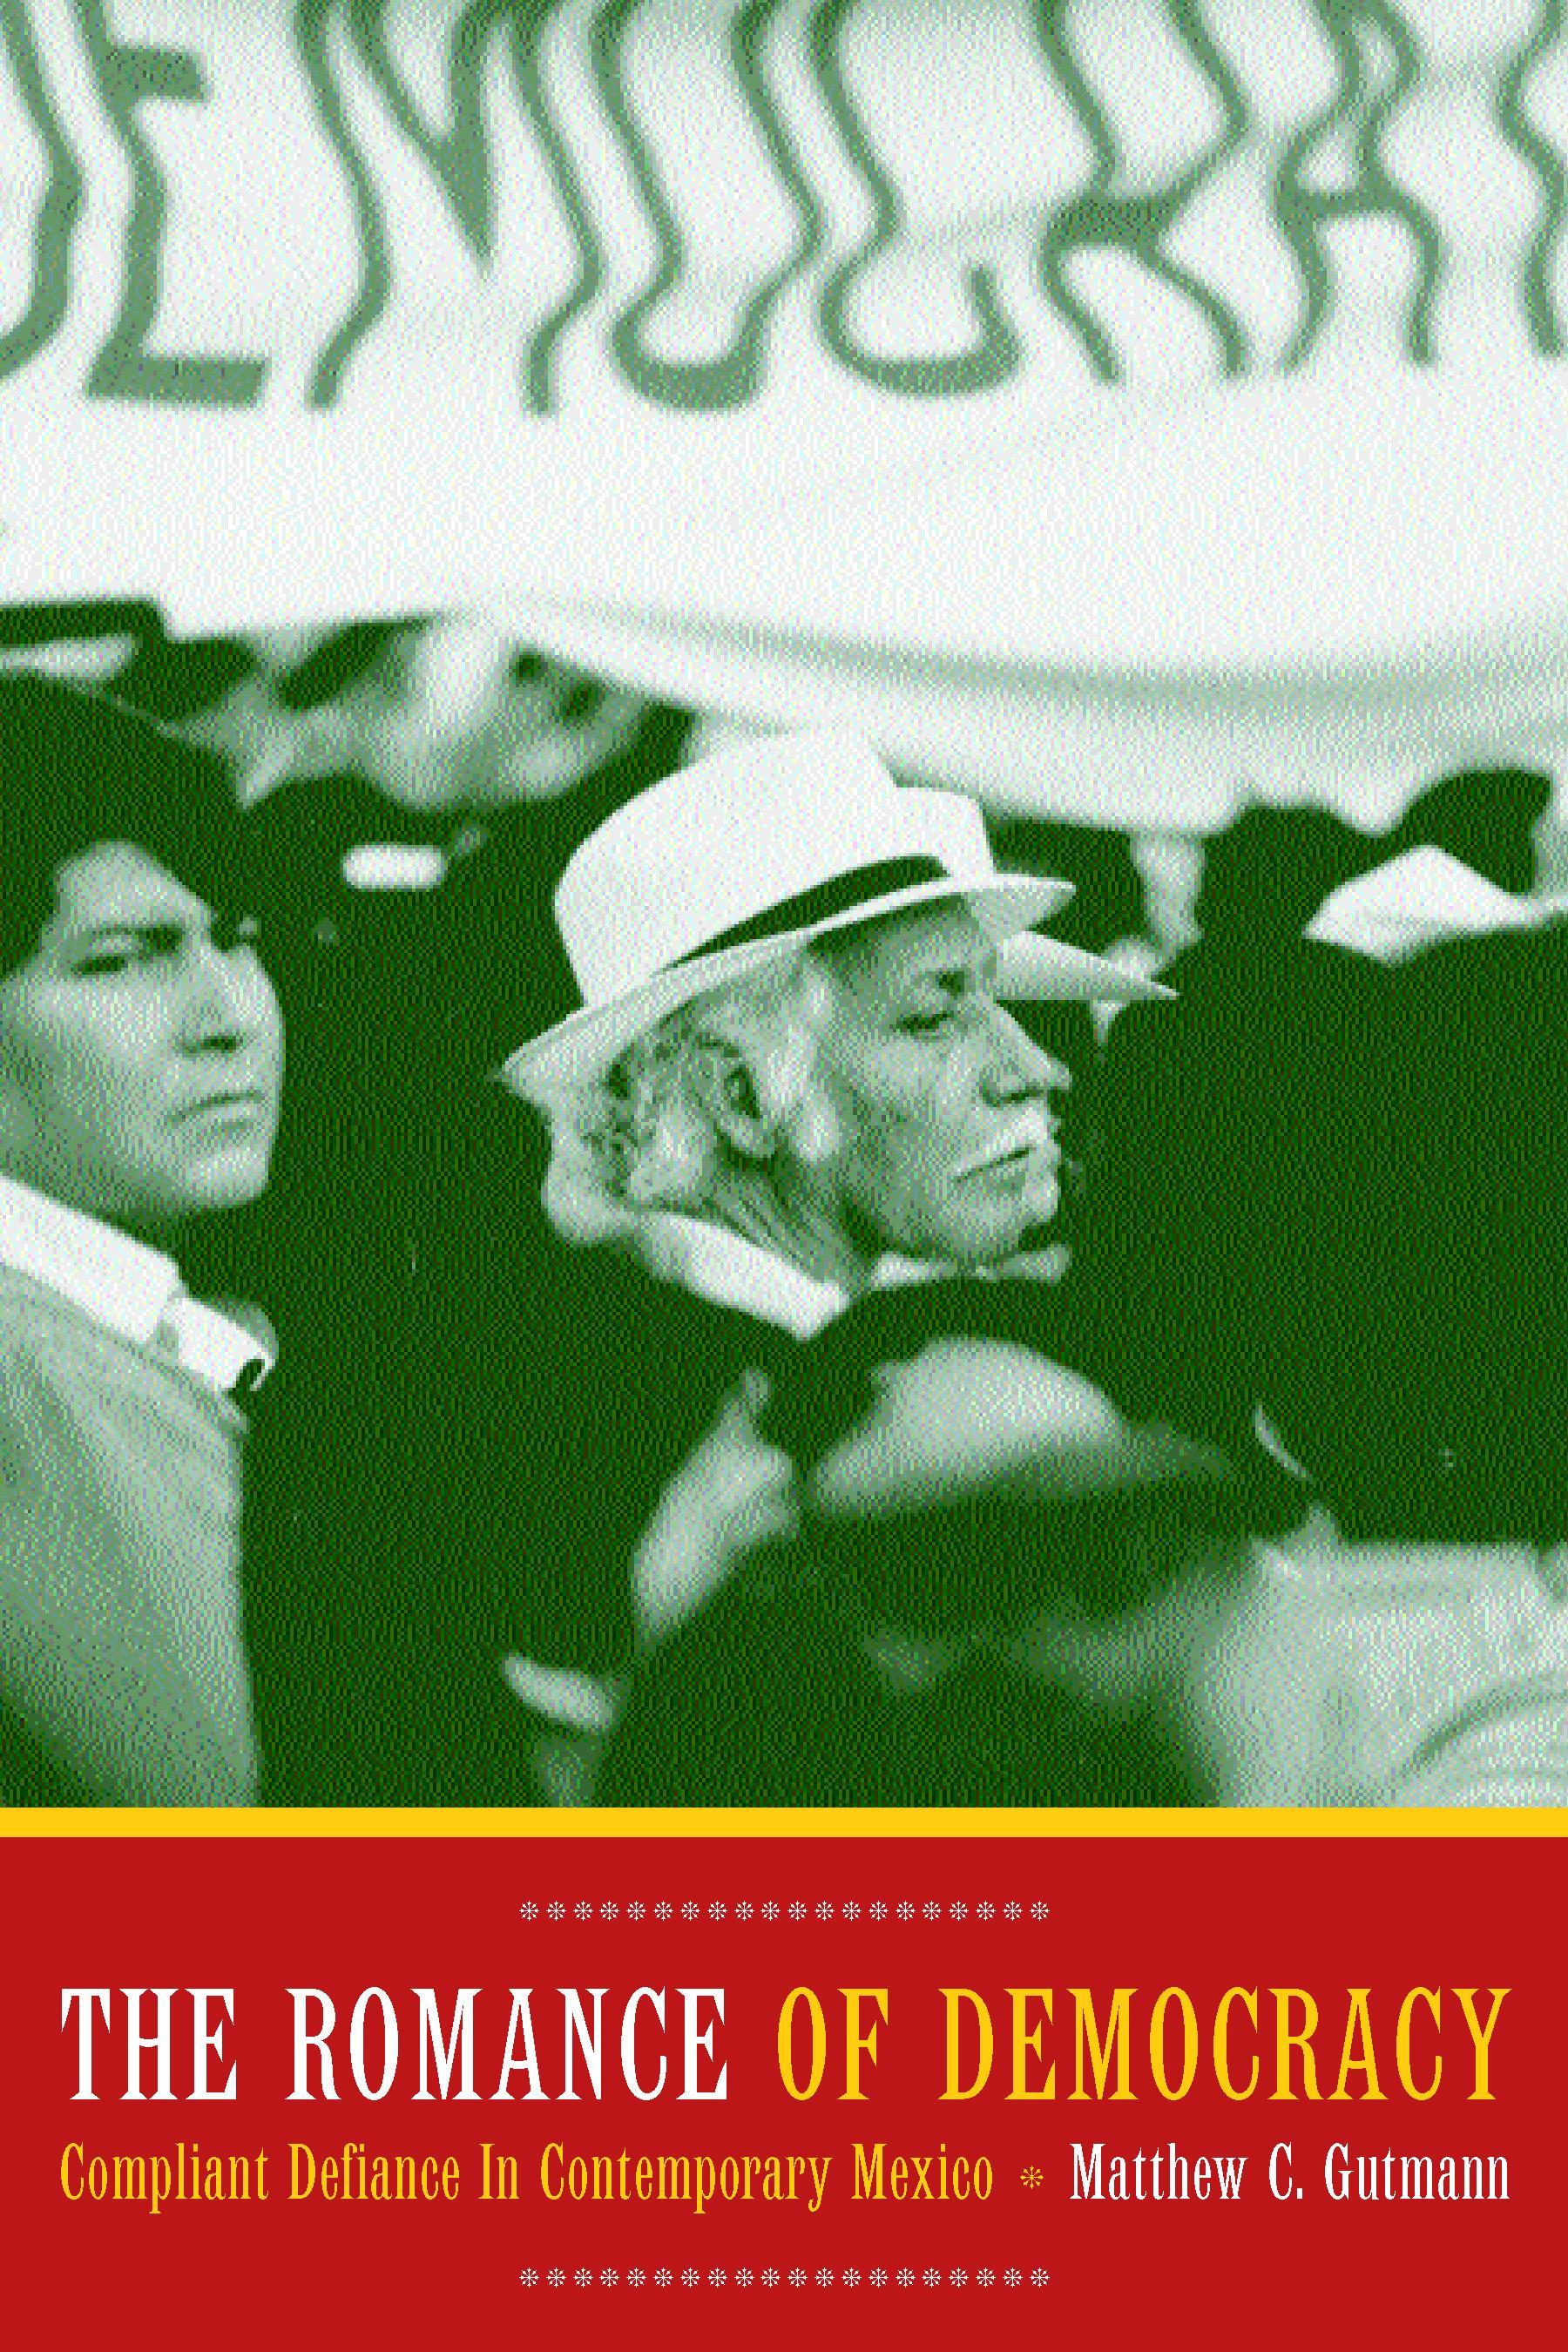 The Romance of Democracy: Compliant Defiance in Contemporary Mexico EB9780520936638